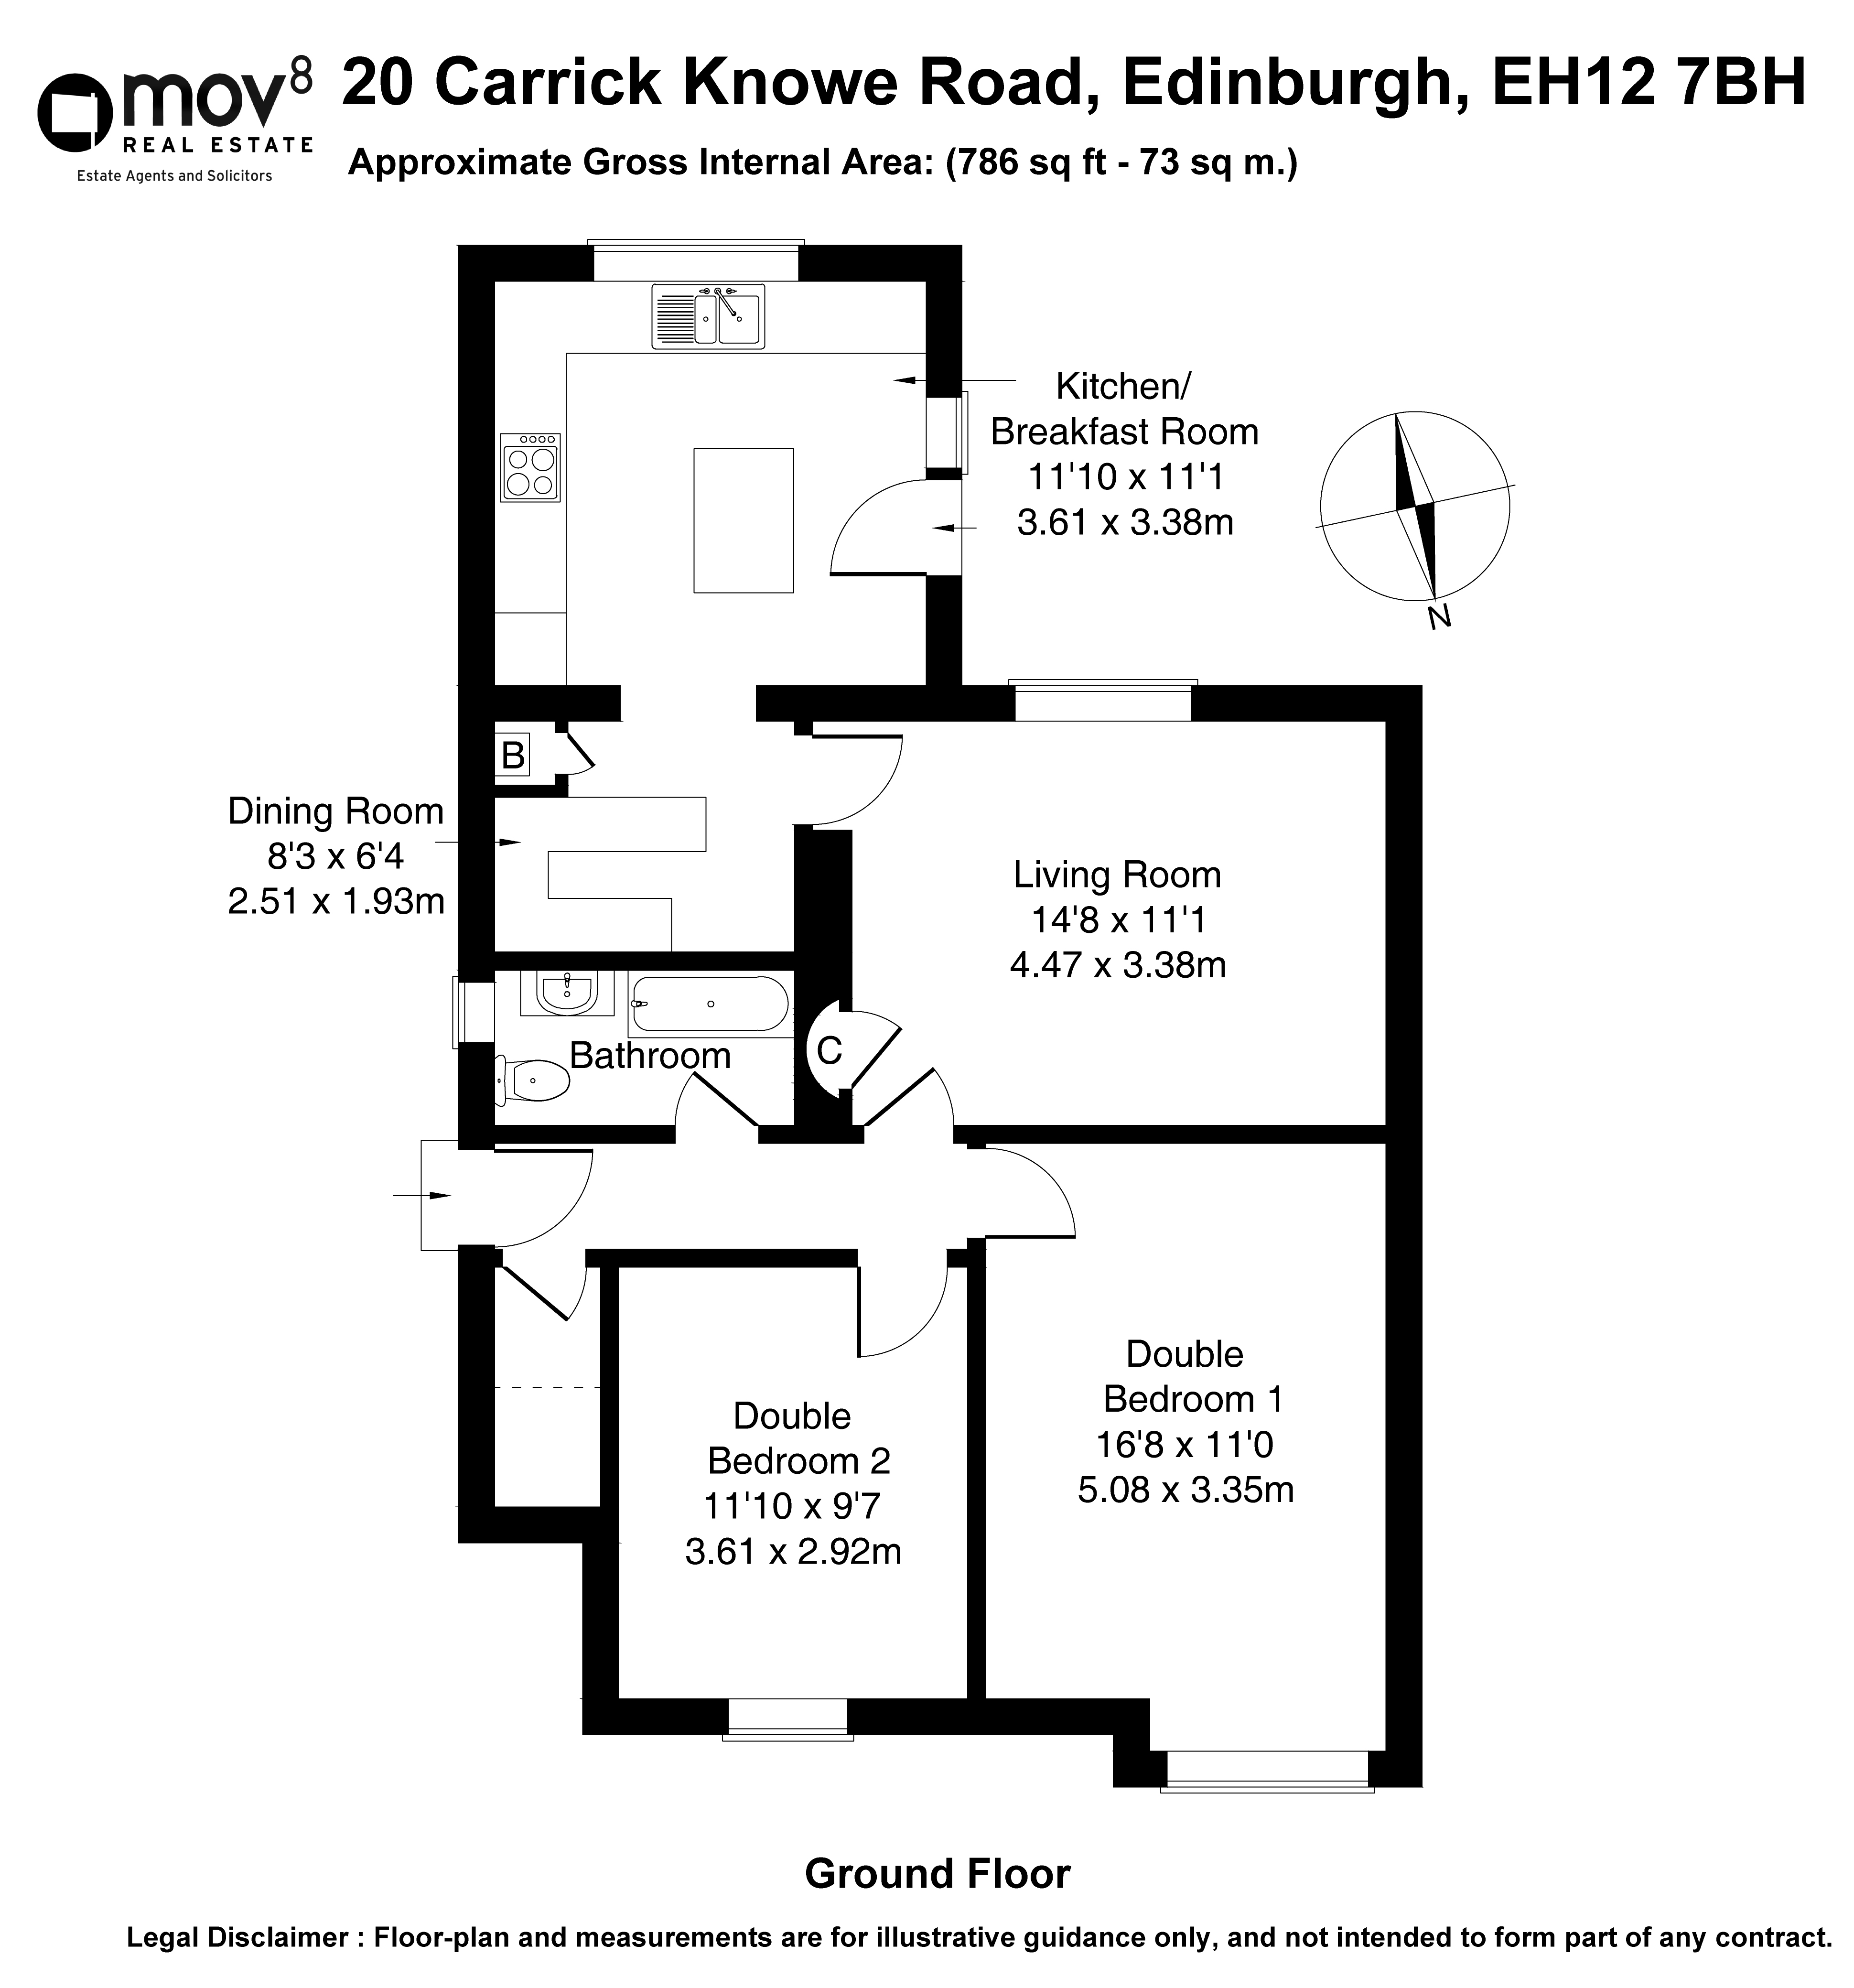 Floorplan 1 of 20 Carrick Knowe Road, Carrick Knowe, Edinburgh, EH12 7BH